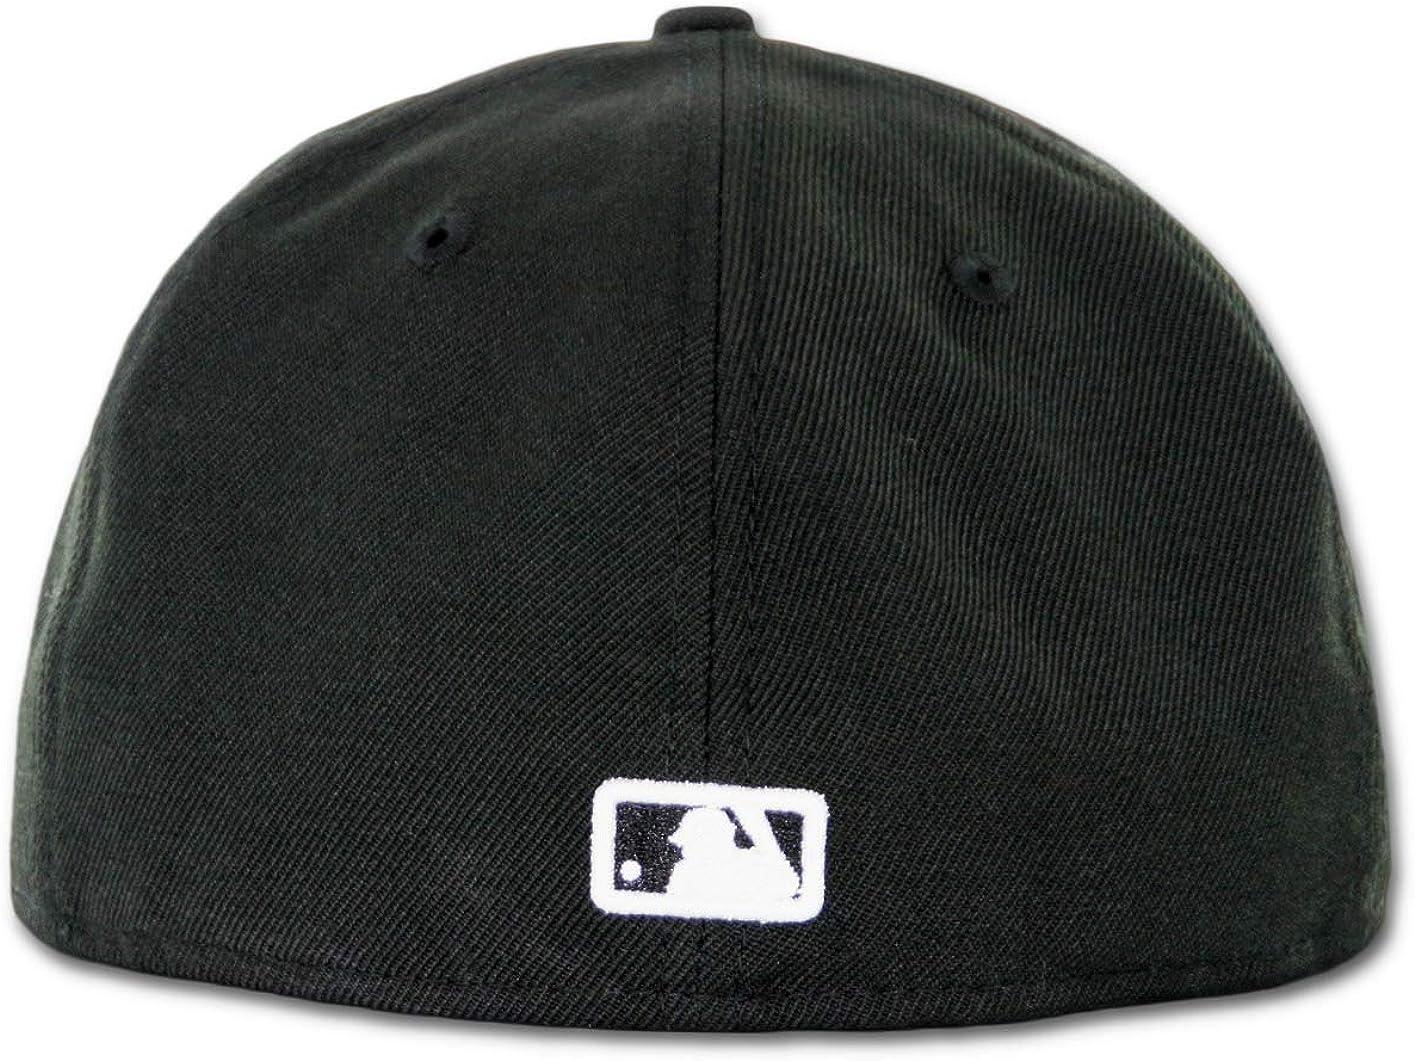 New Era 59Fifty Hat Washington Nationals W Basic Black Fitted Cap 11591091